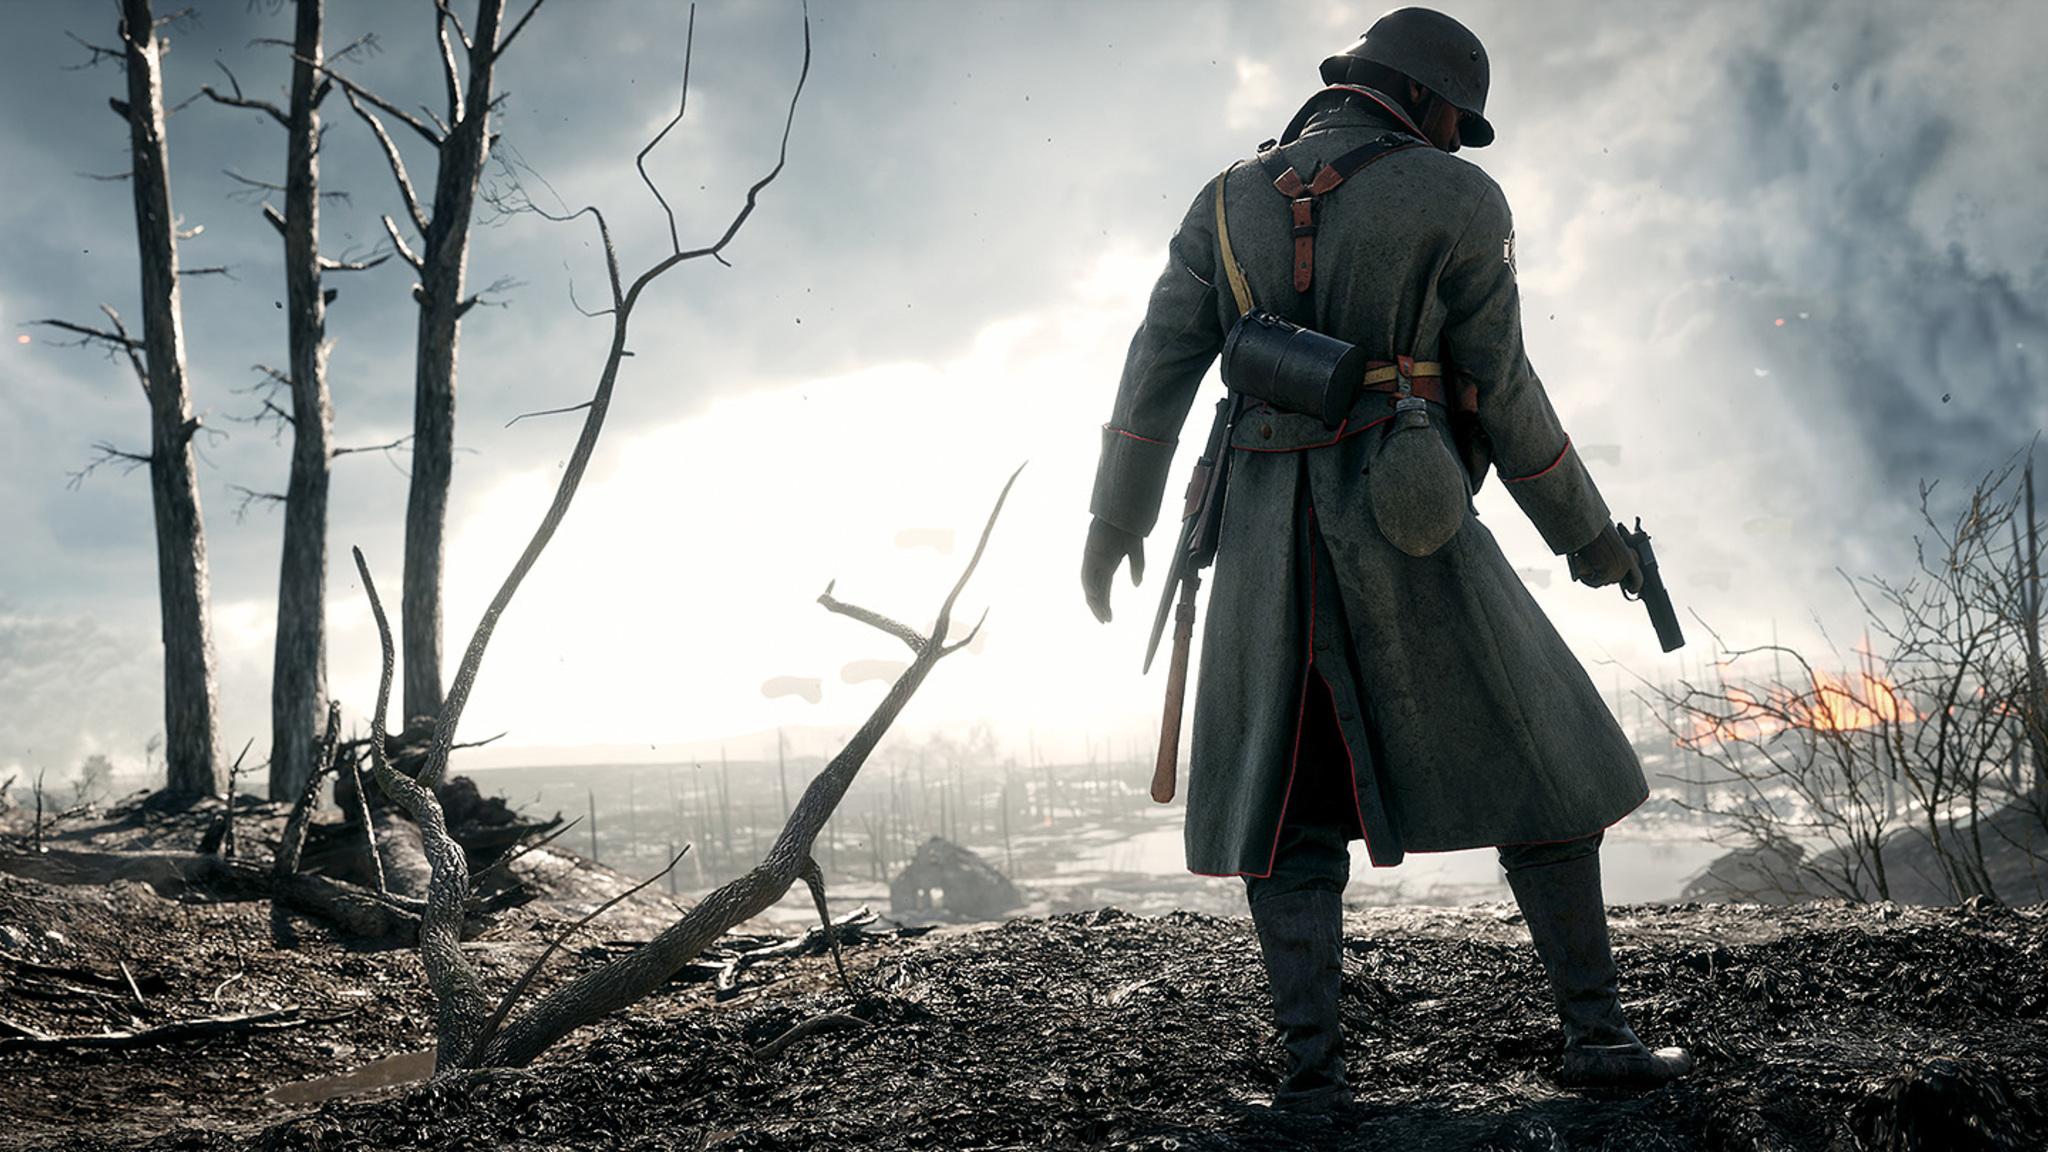 2048x1152 Battlefield 1 Game Play HD 2048x1152 Resolution ...